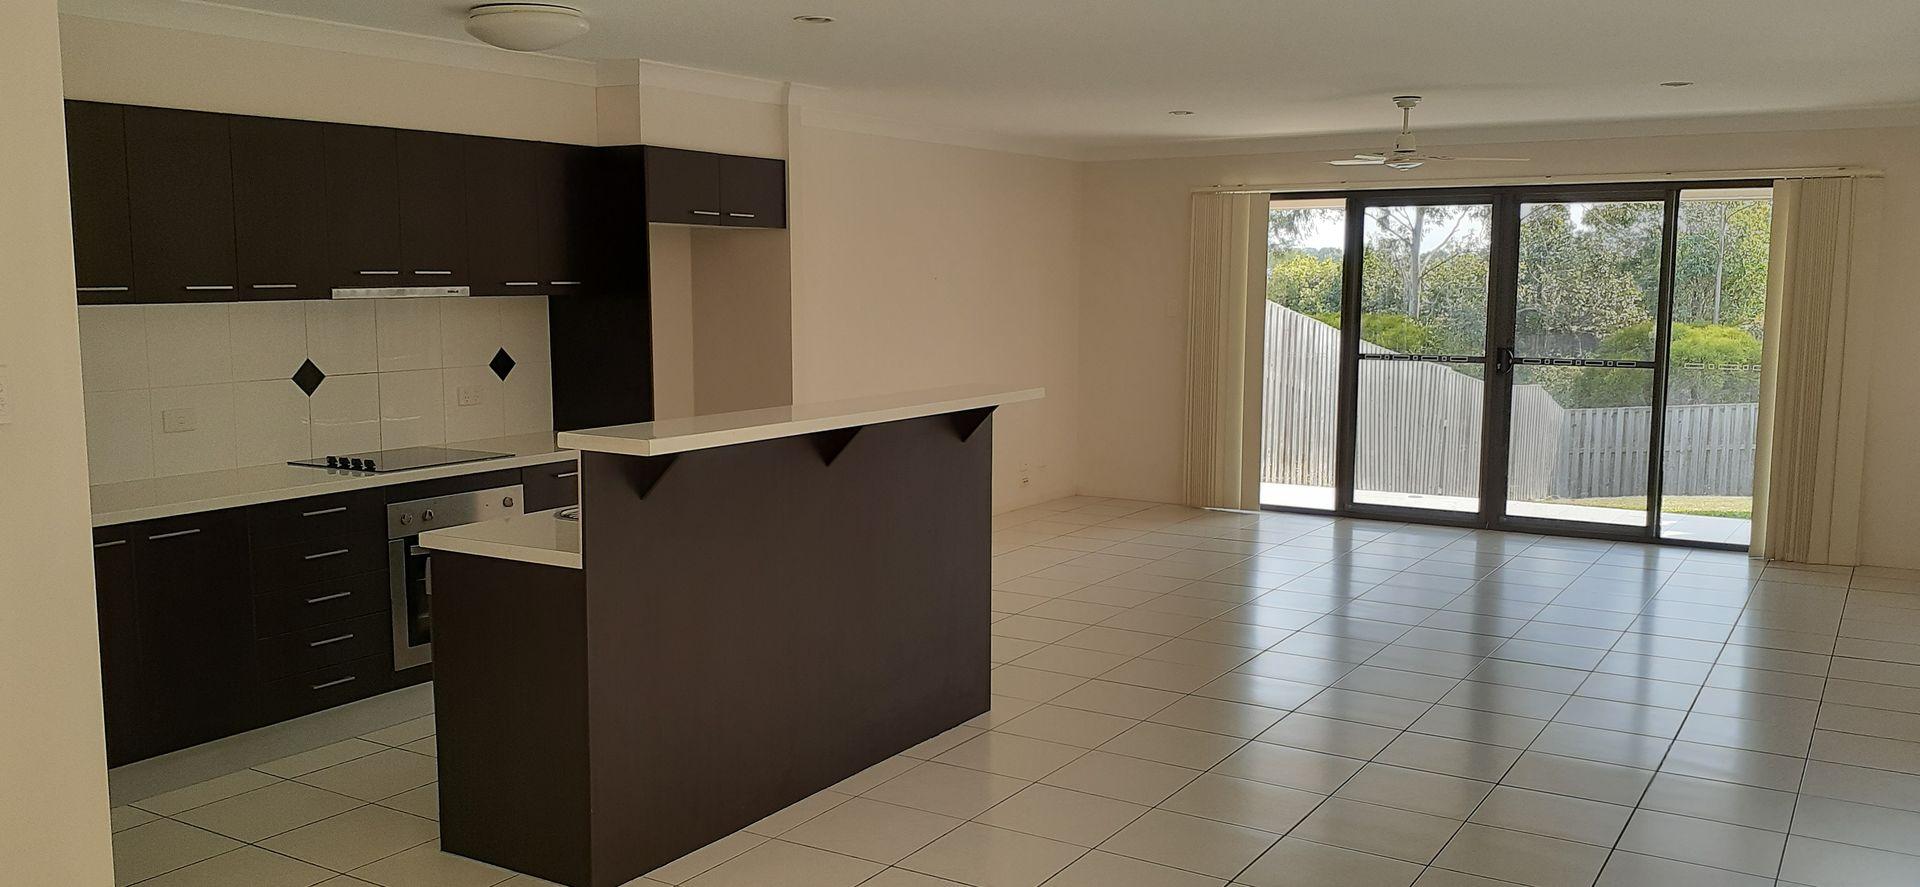 2/16 Pecan Drive, Upper Coomera QLD 4209, Image 0